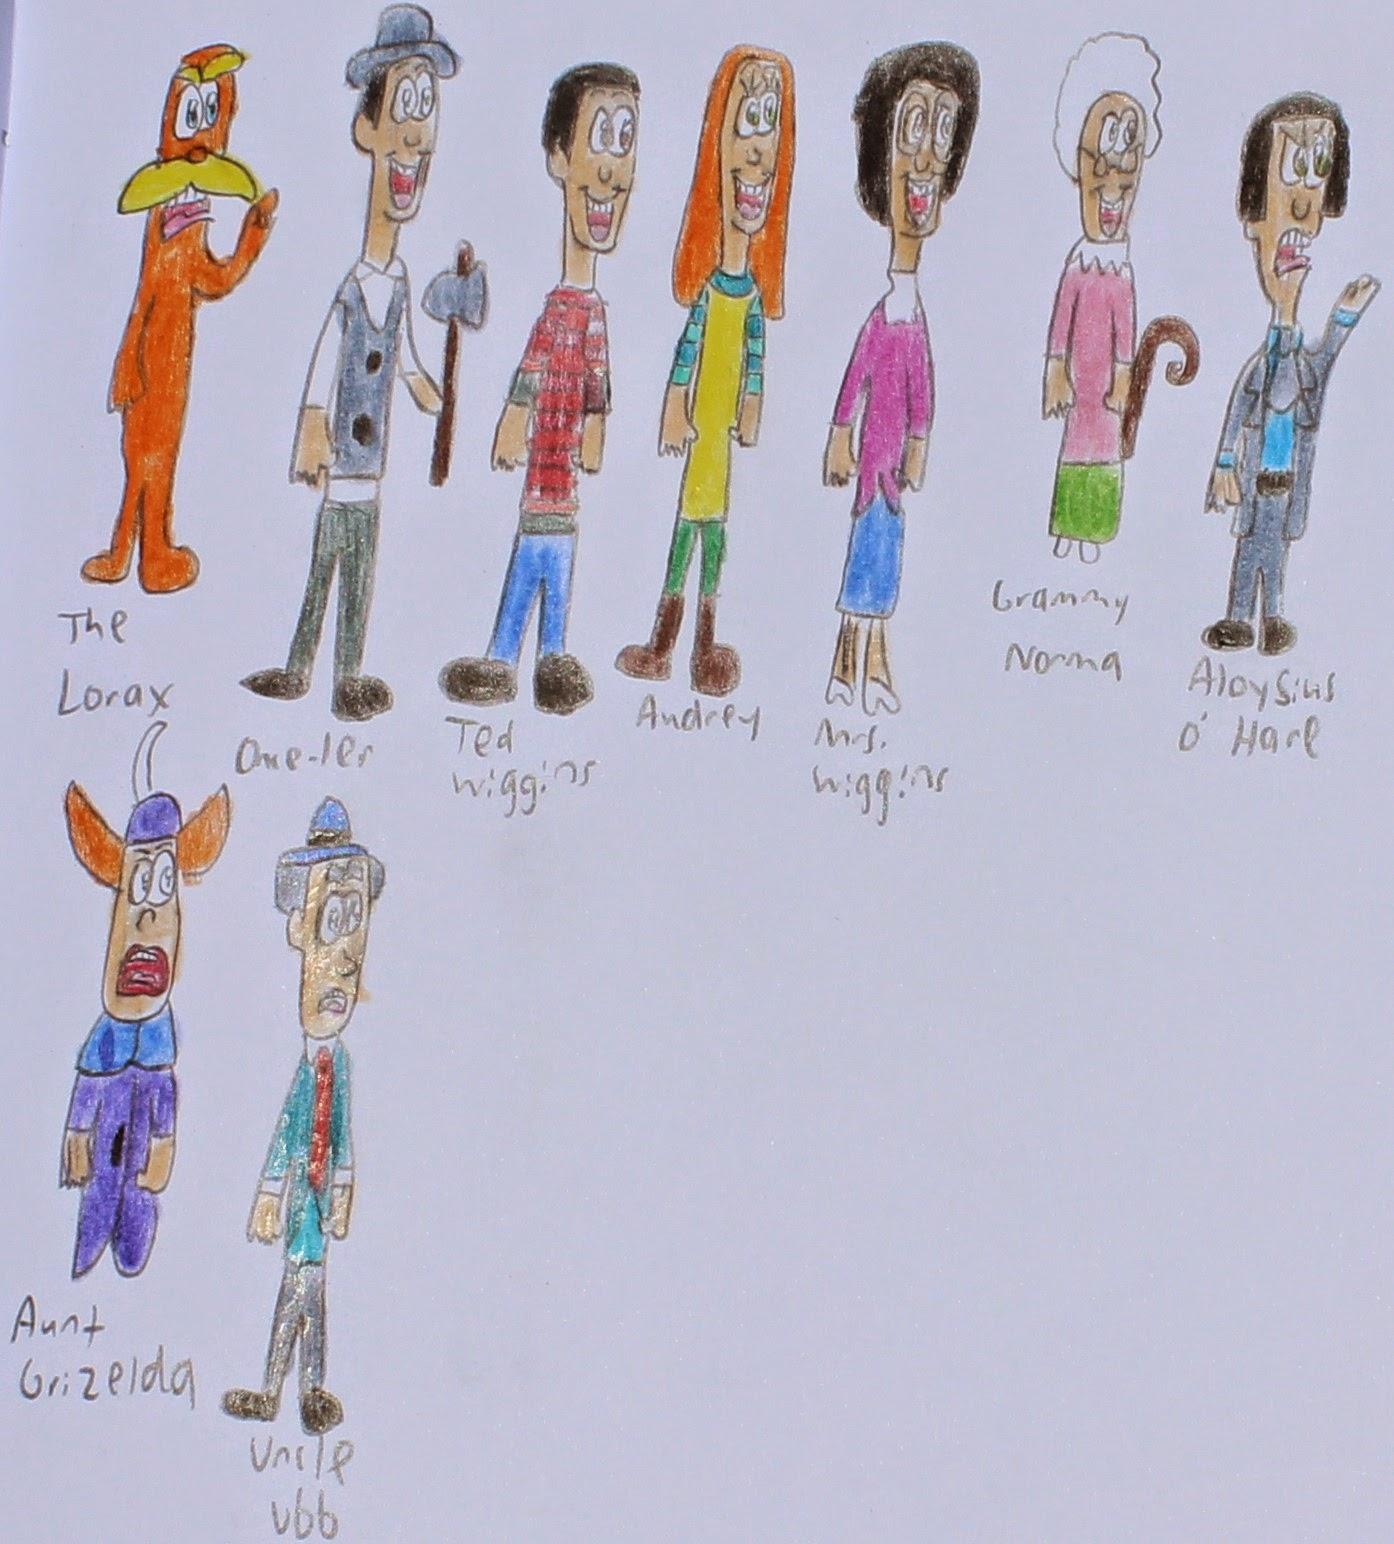 Franklin's World Of Cartoons: The Lorax 2012